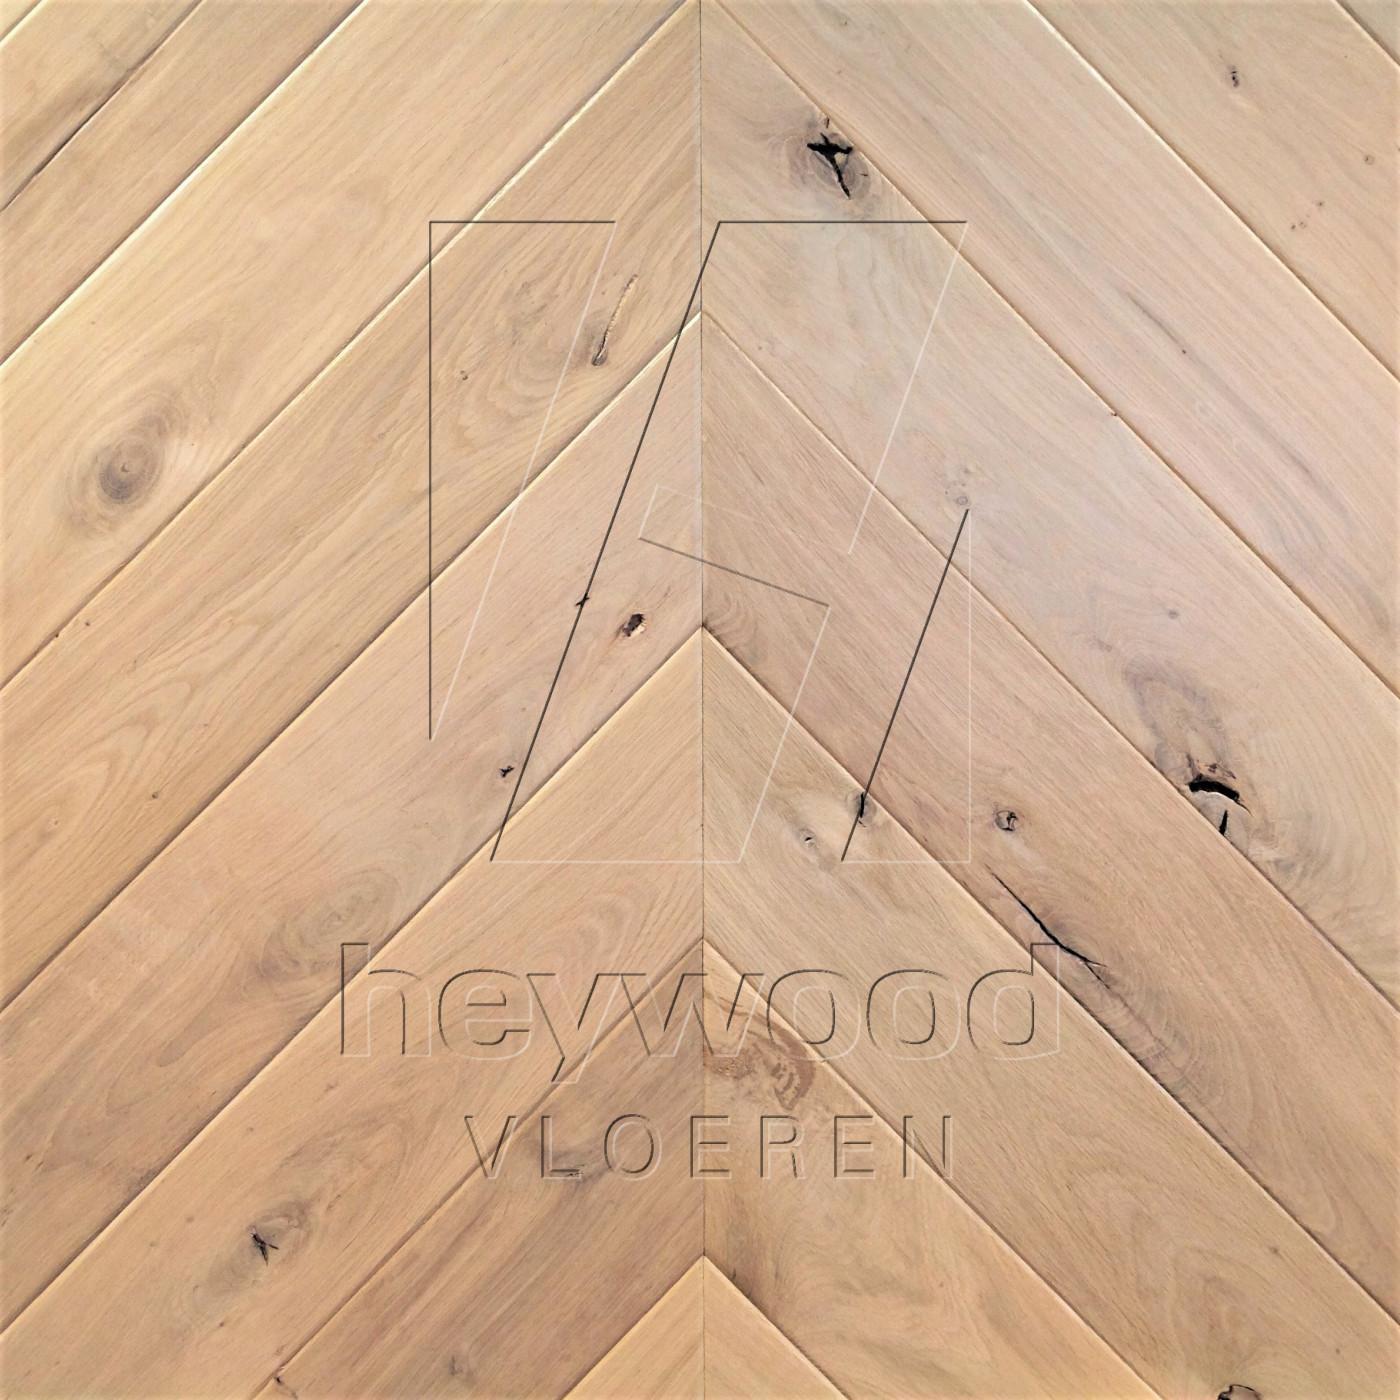 Antique Chevron 'Virgin Oiled' in Chevron of Pattern & Panel Floors